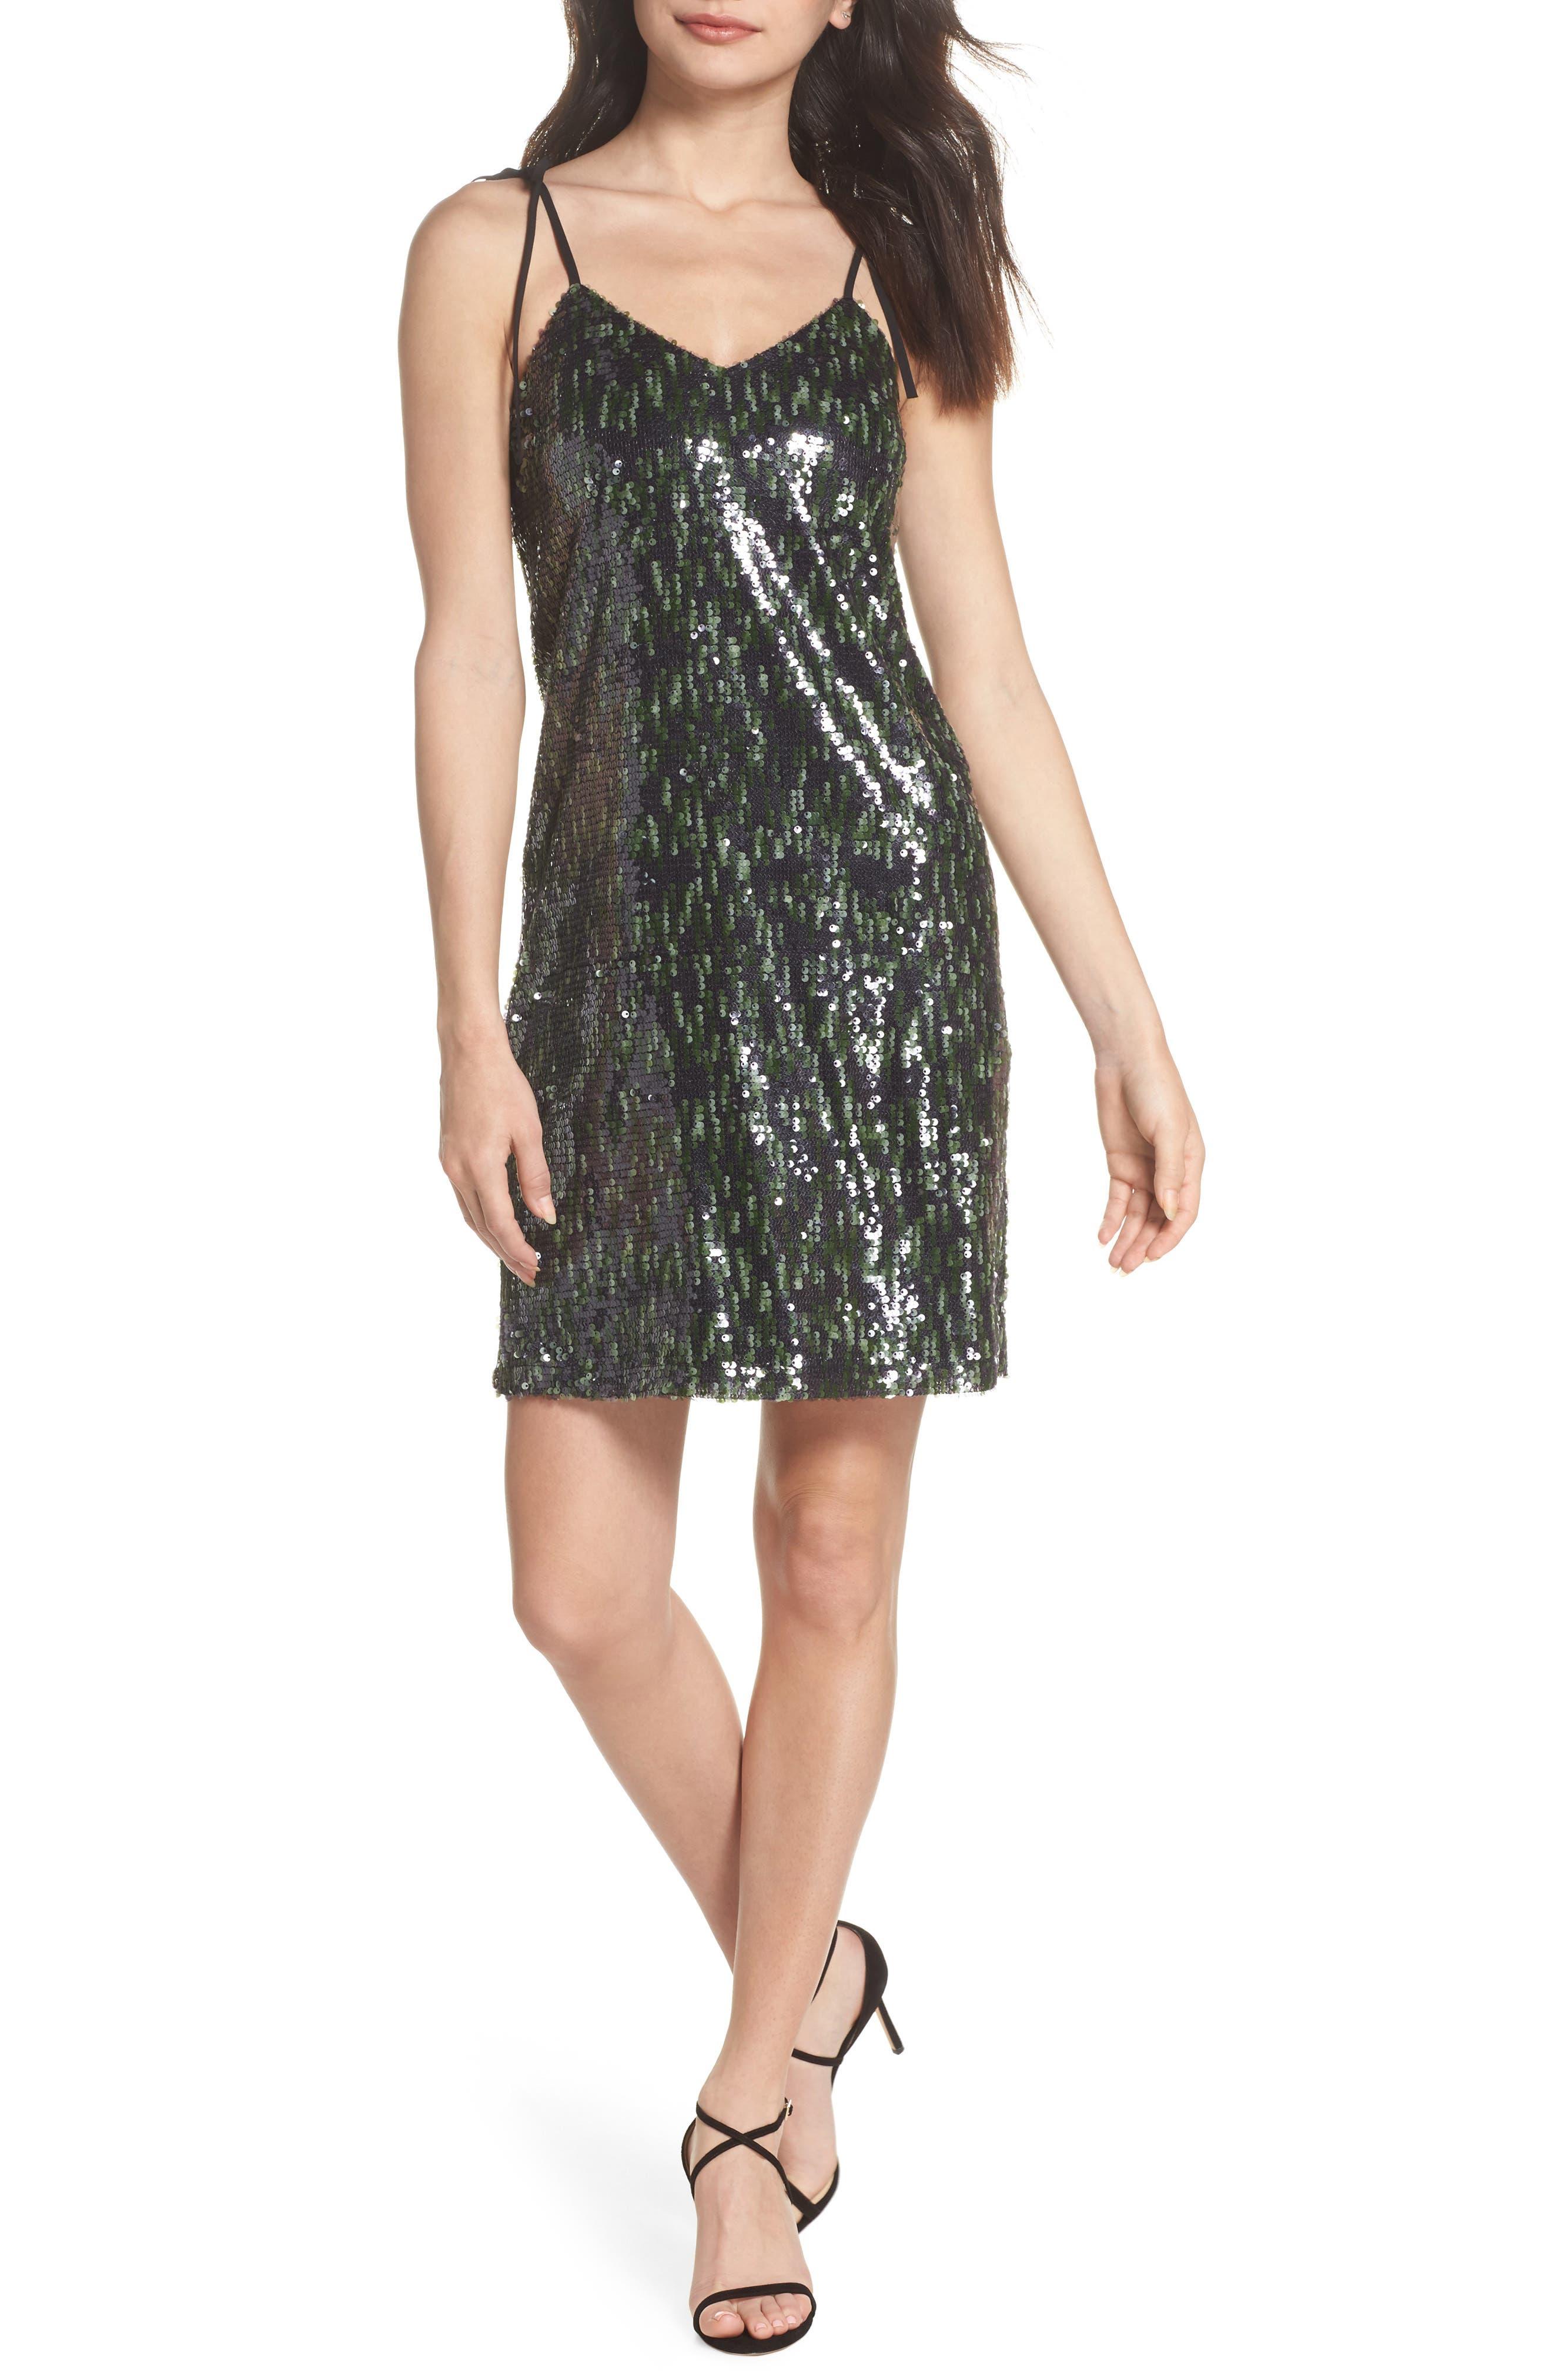 Camo Sequin Dress,                             Main thumbnail 1, color,                             BLACK/ GREEN